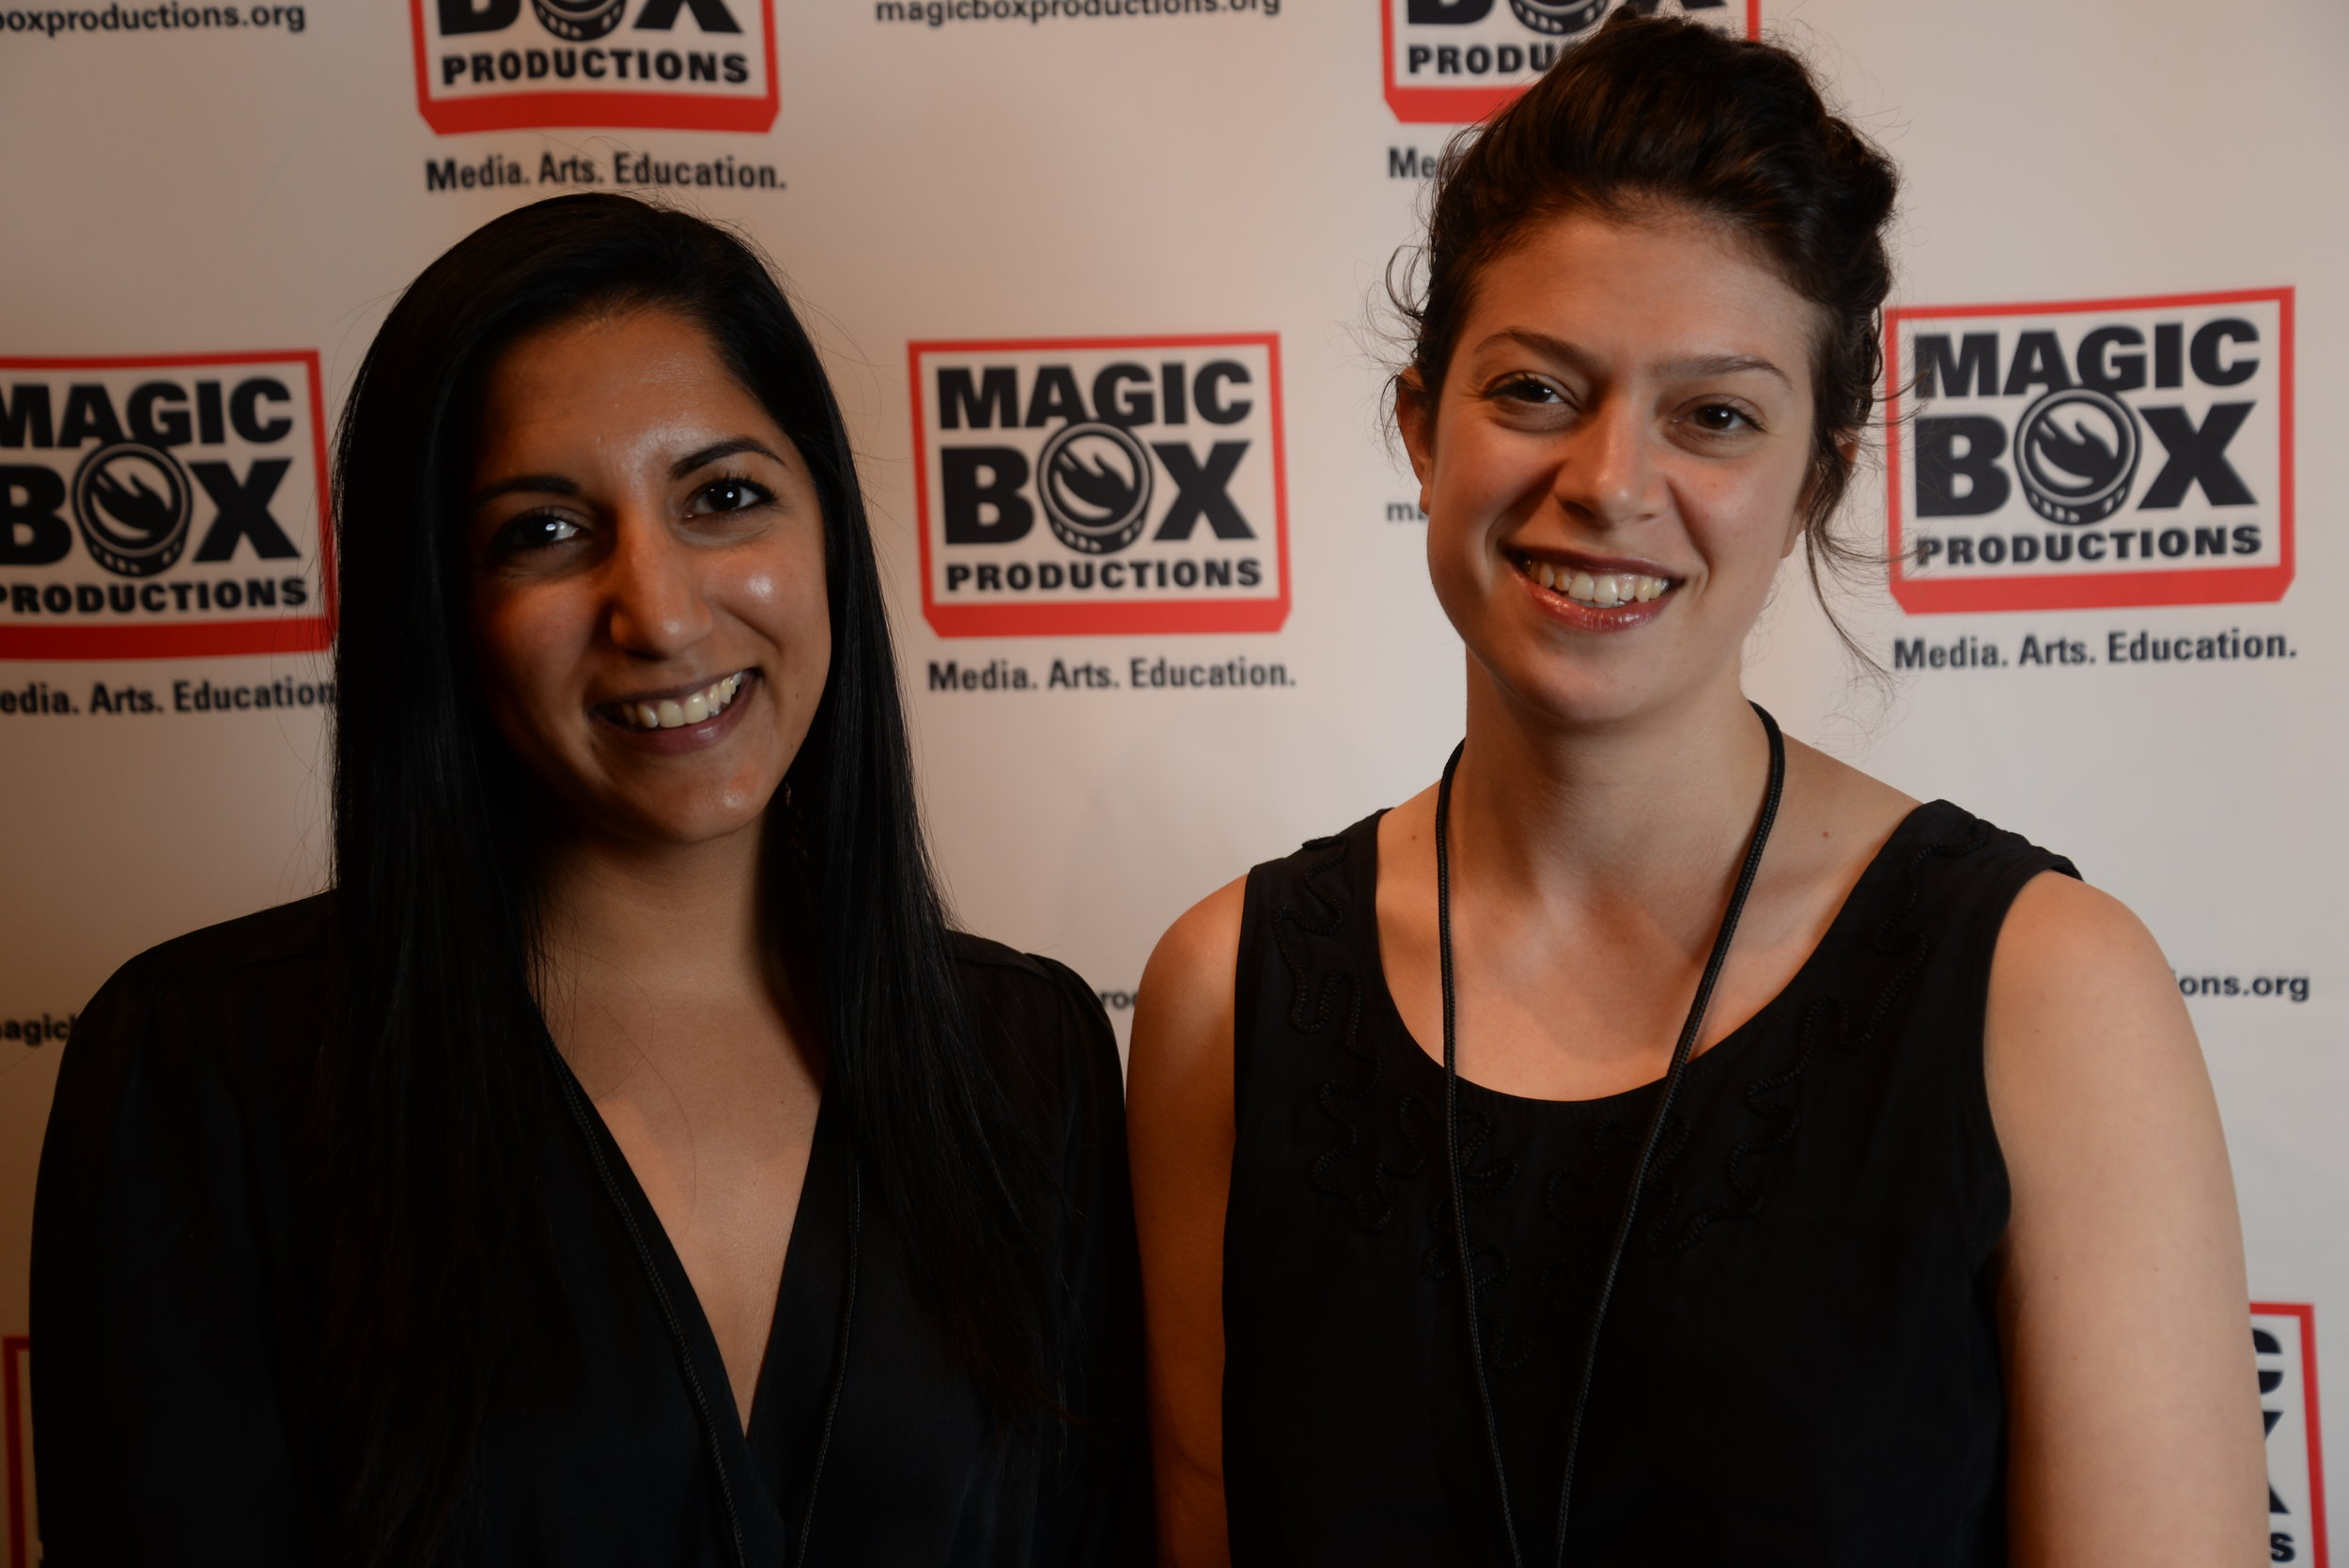 Magic Box Executive Board Members Pashmeena Hilal and Nora Rodriguez